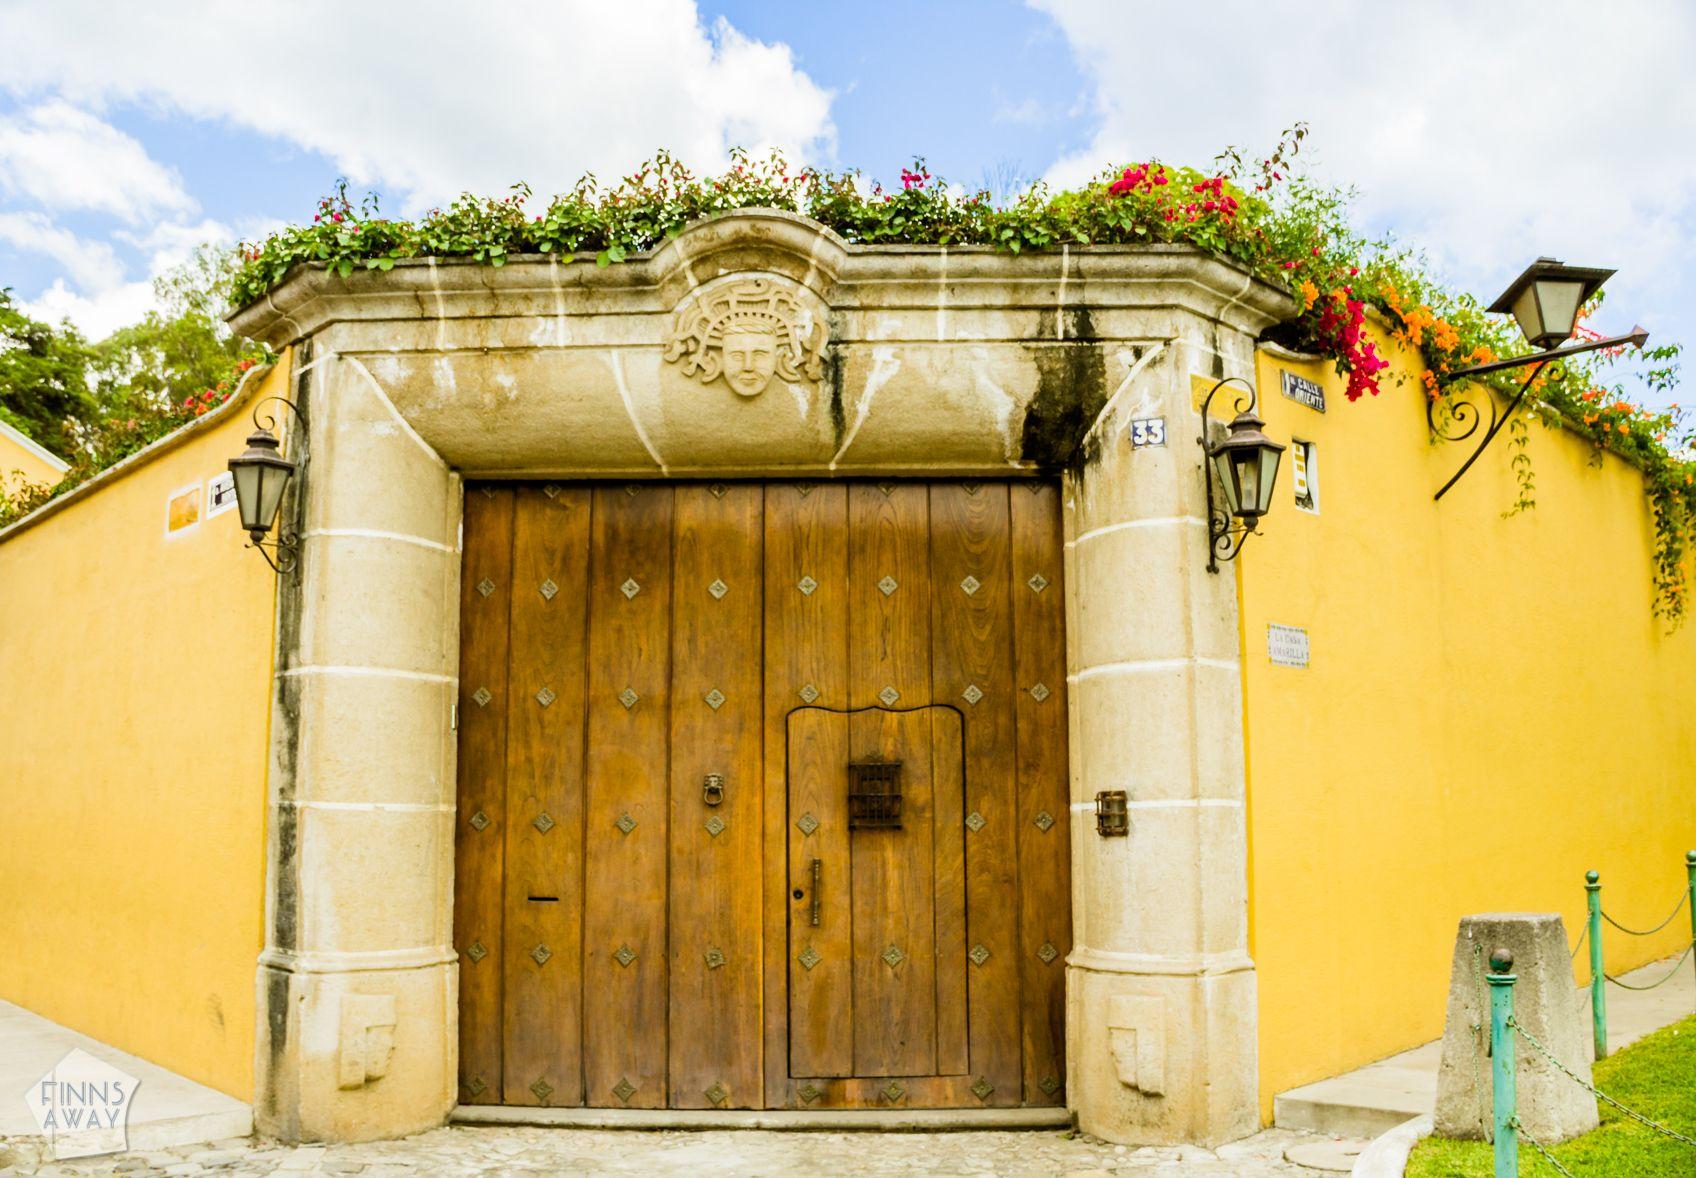 Introduction to historical Antigua Guatemala   FinnsAway Travel Blog